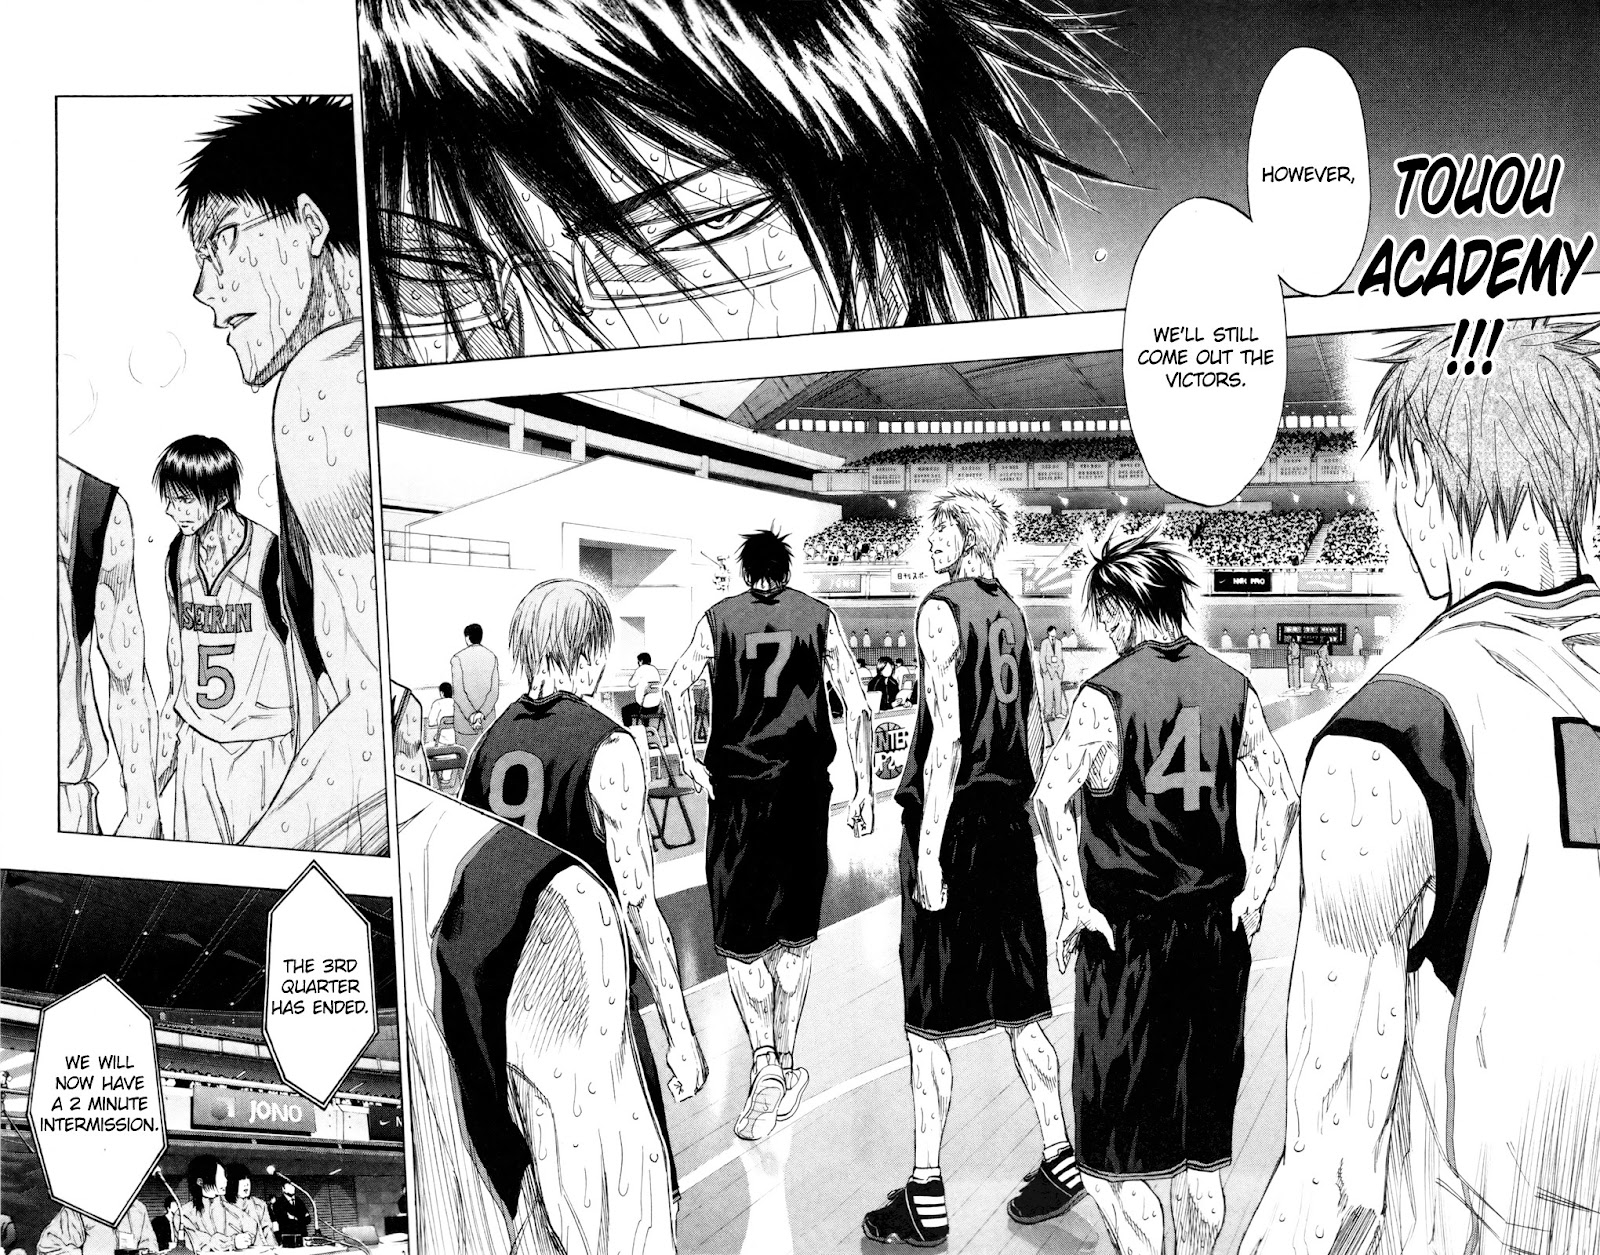 Kuroko no Basket Manga Chapter 130 - Image 06-06